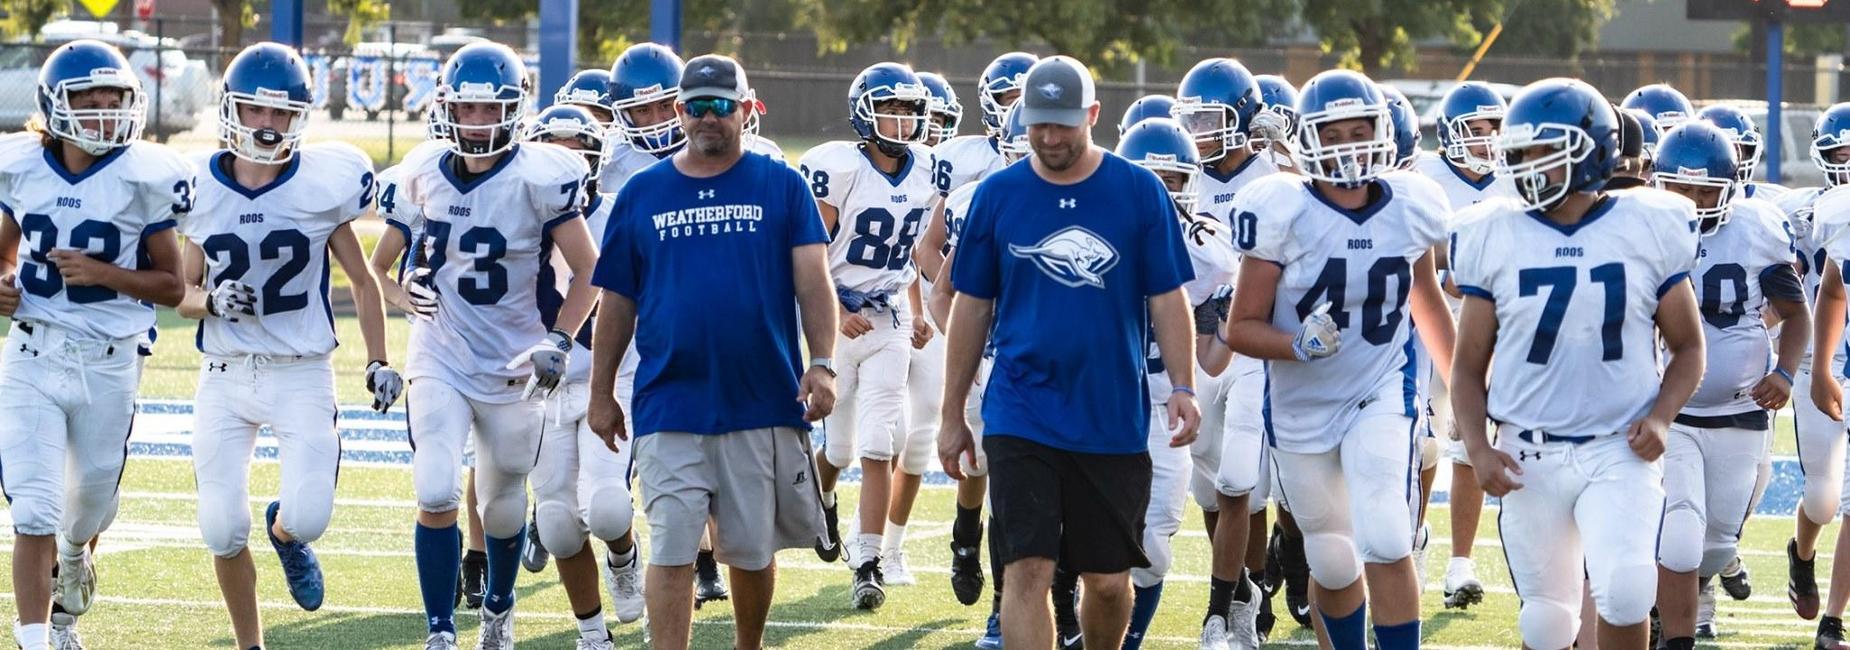 Freshman football team entering the field